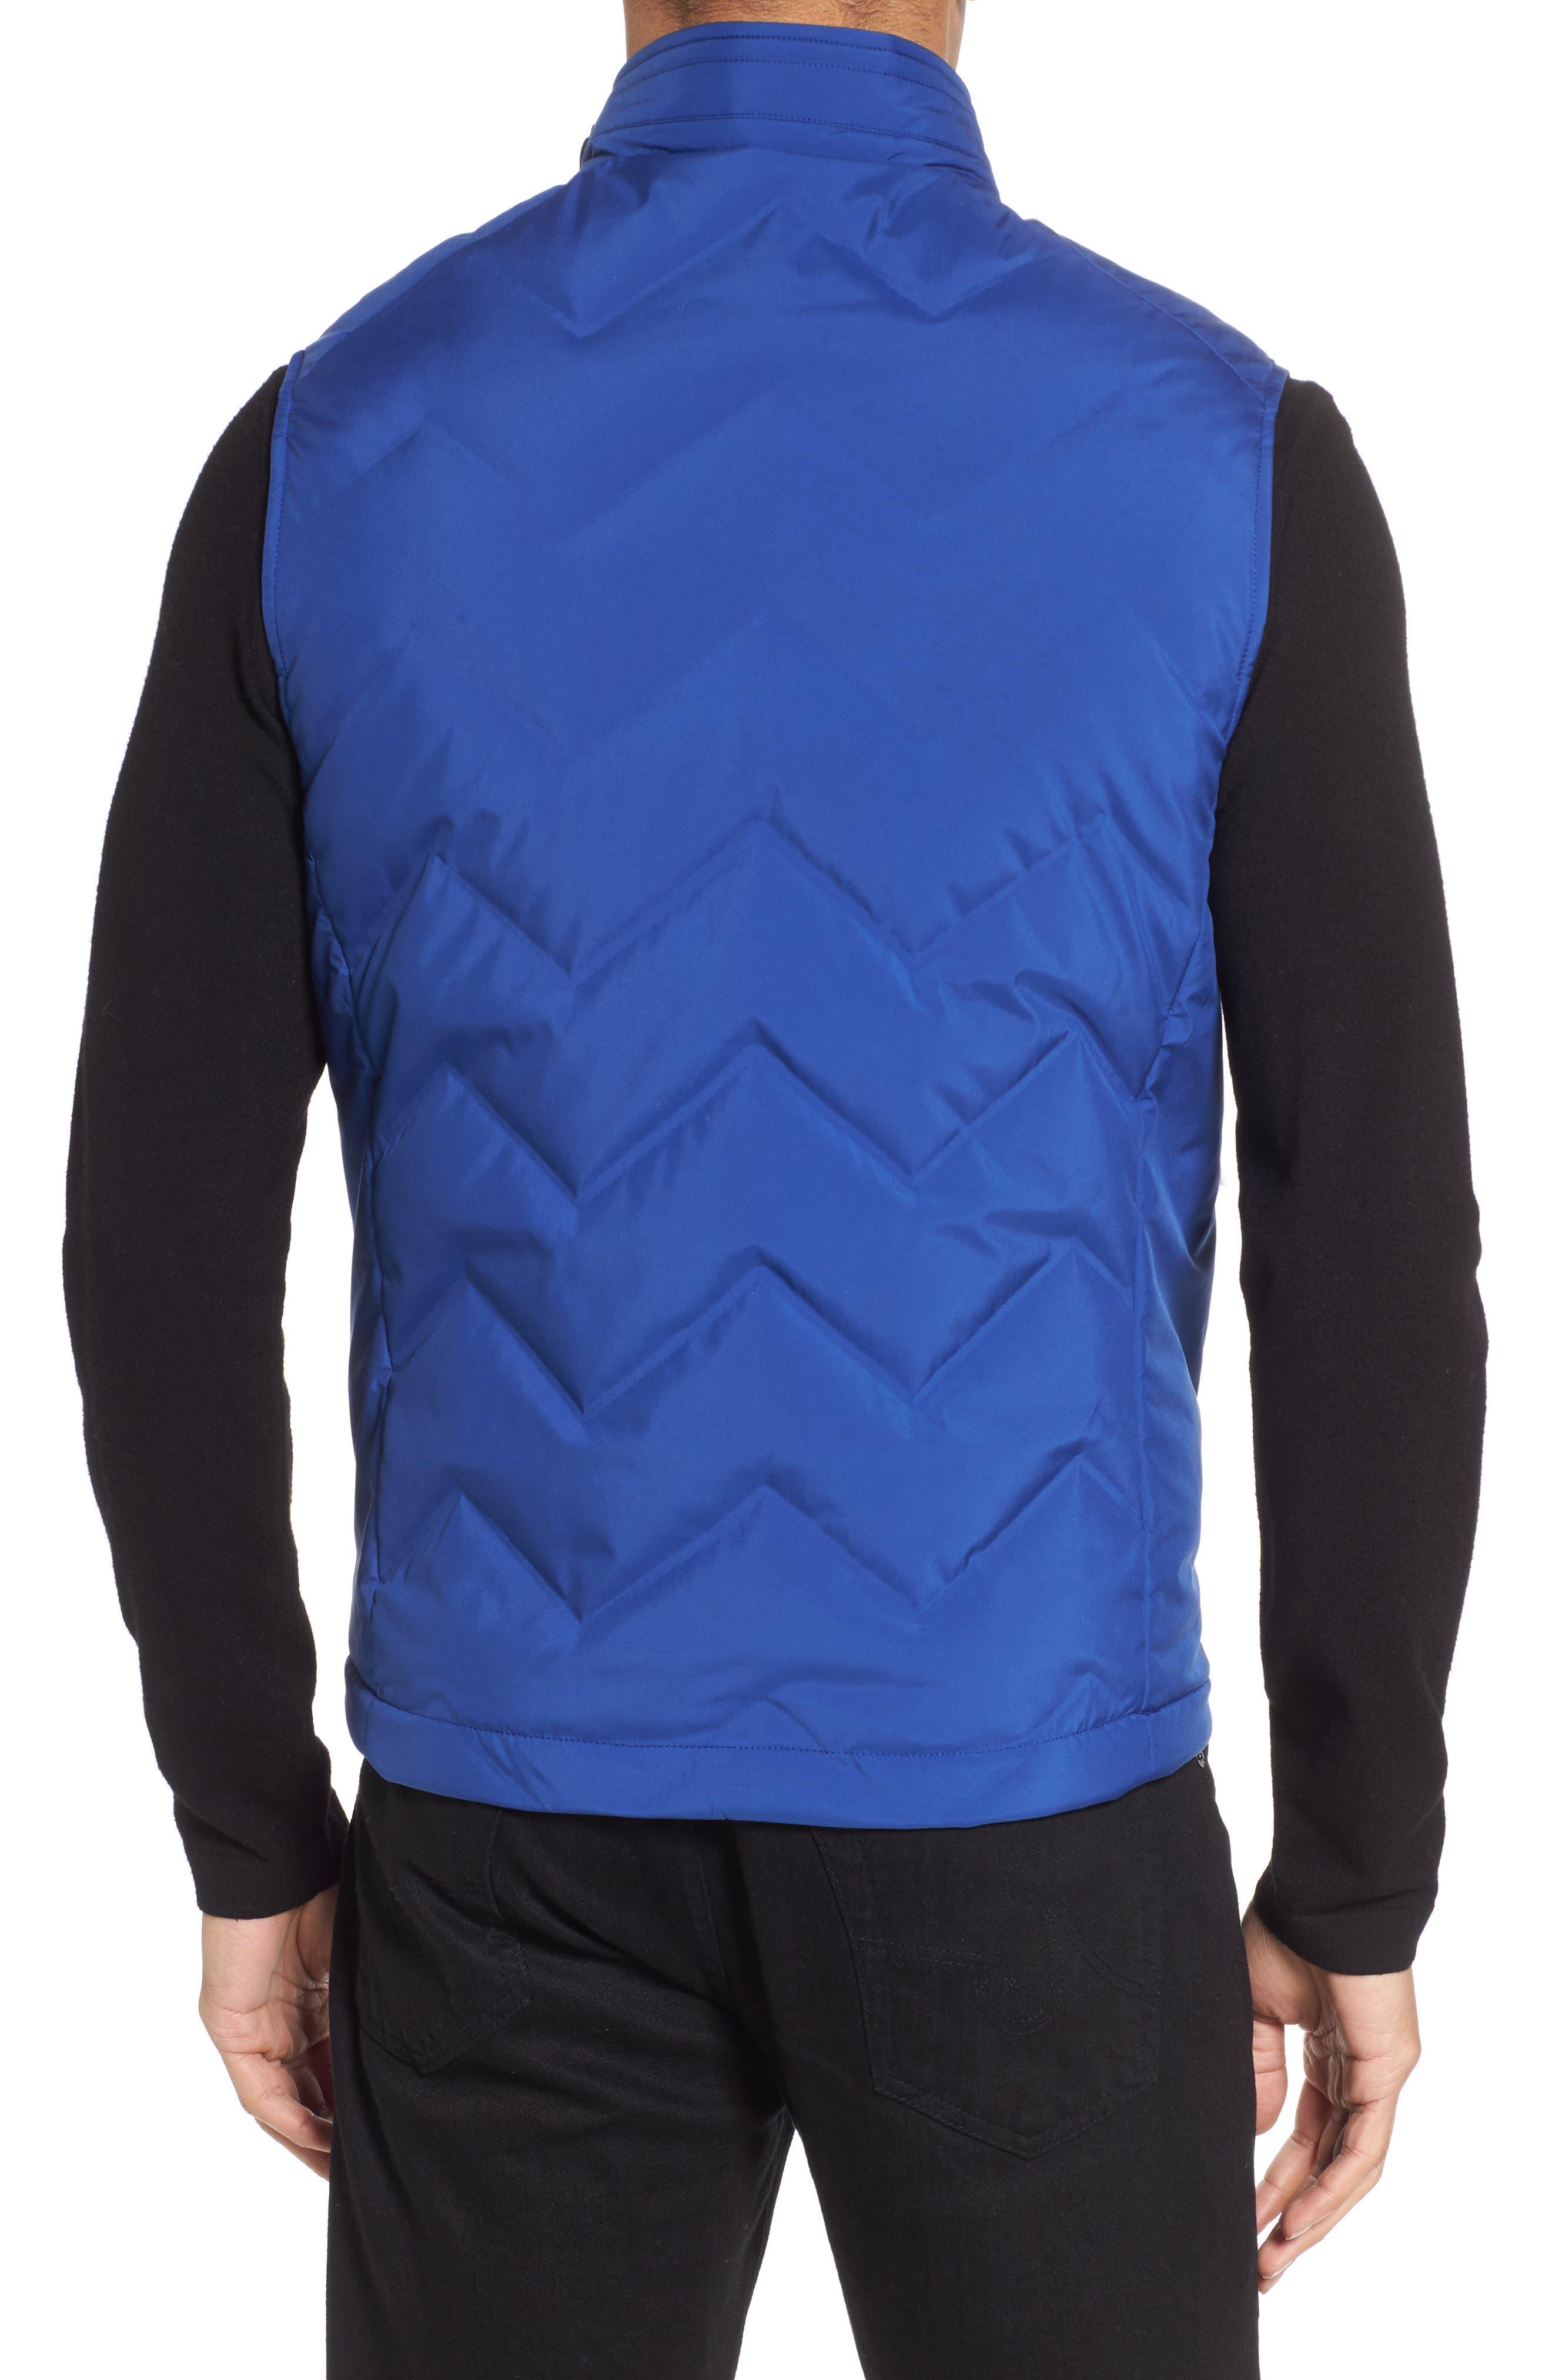 Hobart Down Vest,                             Alternate thumbnail 2, color,                             BRIGHT BLUE